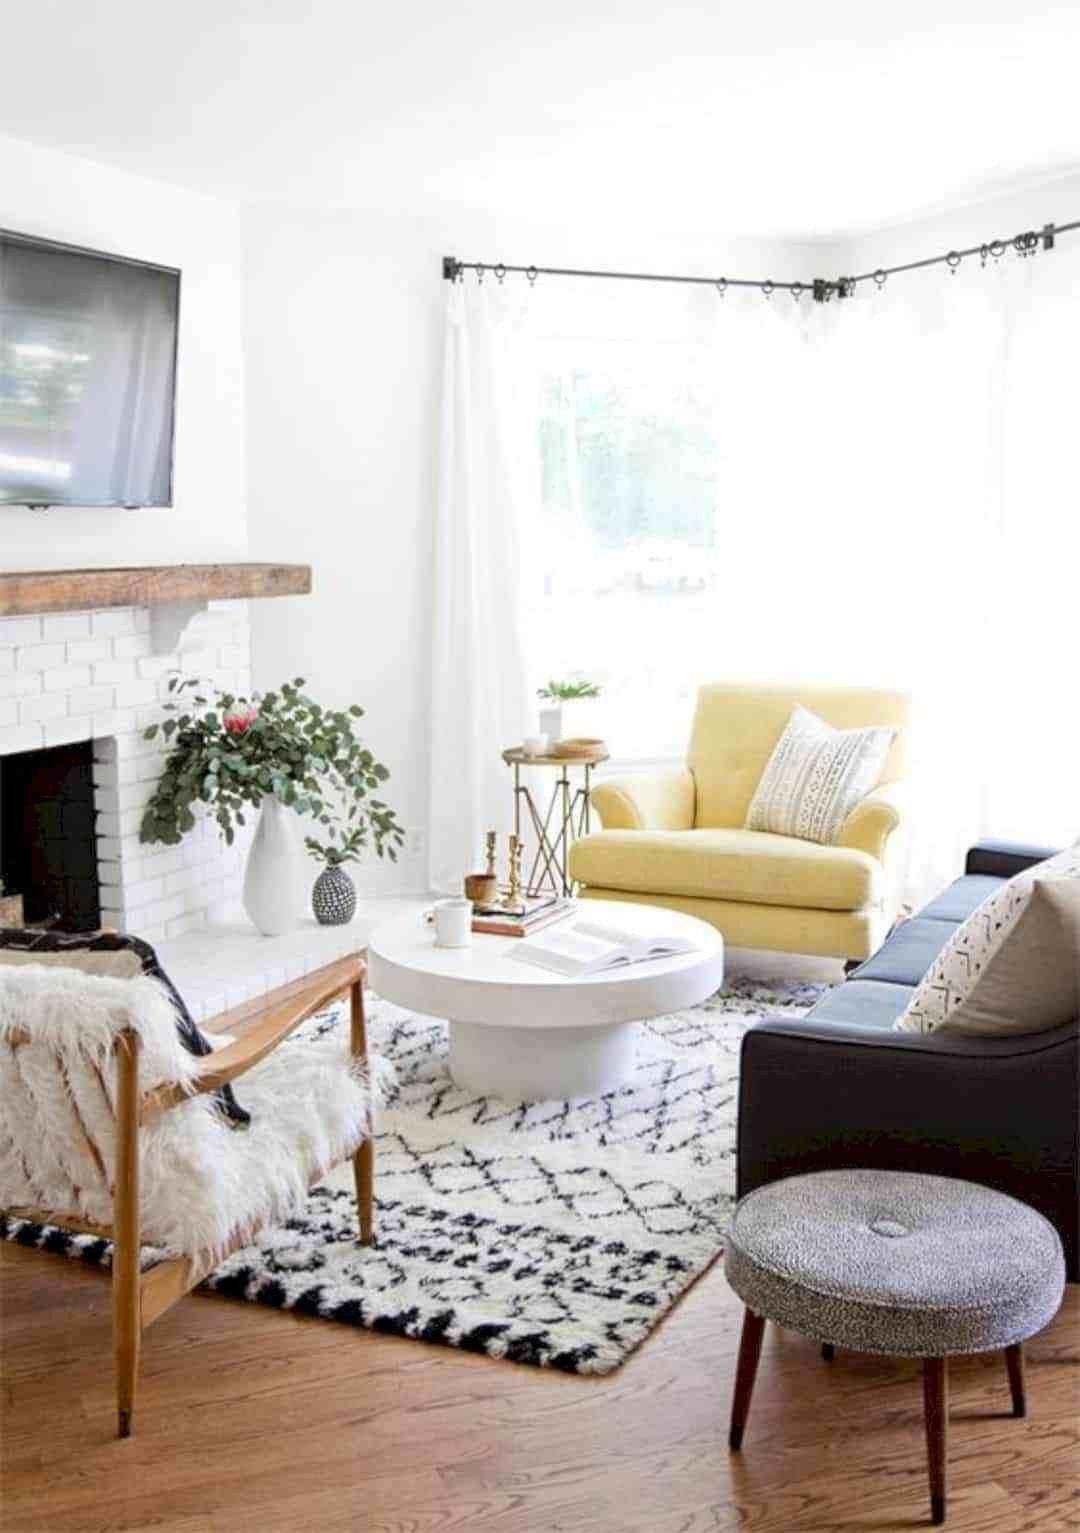 Living Room Furniture Ideas Elegant 16 top Small Living Room Furniture Ideas Futurist Architecture